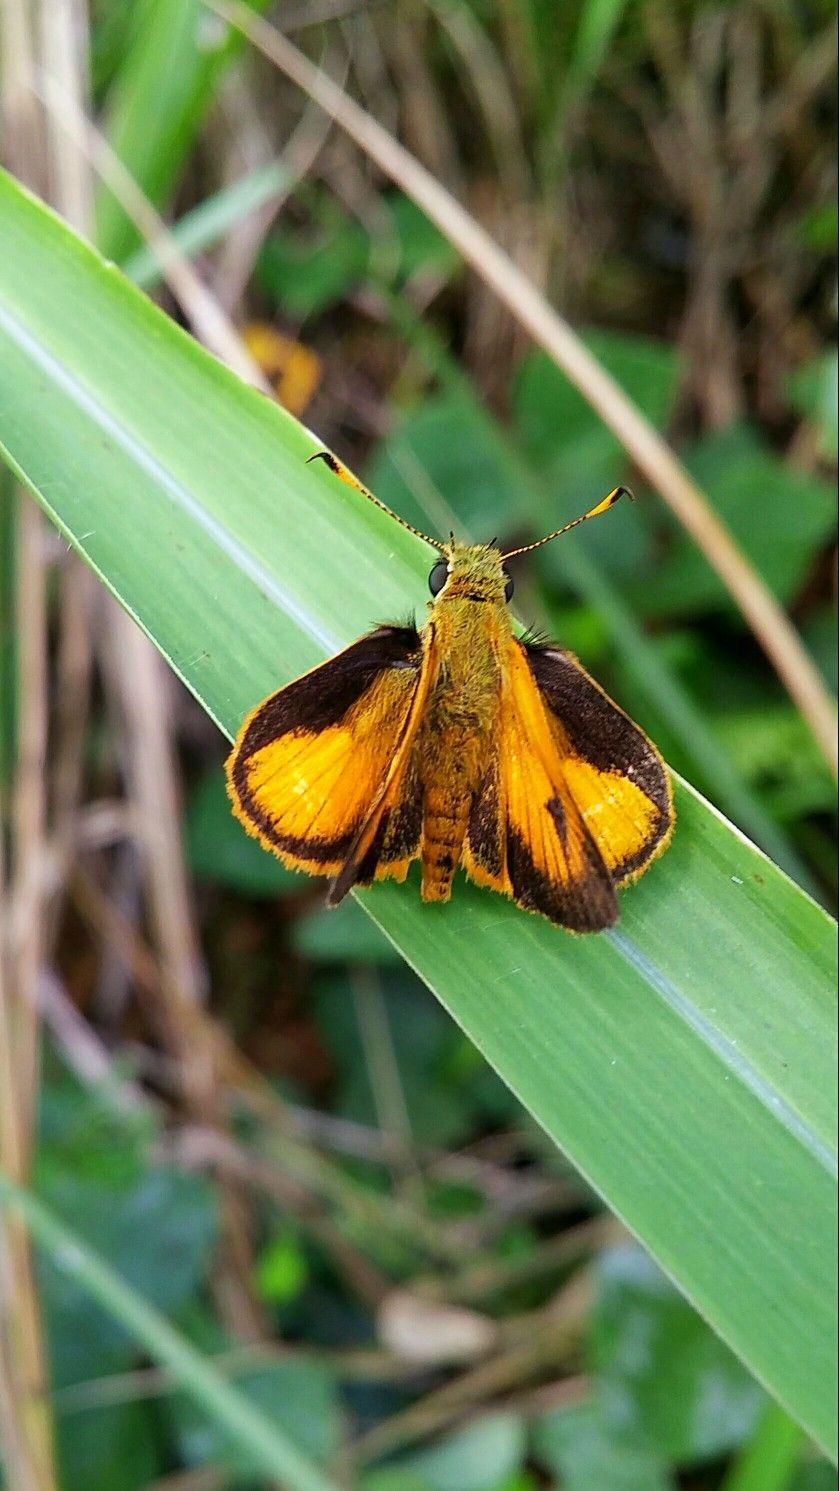 Mariposa Patrona Lepidoptera hesperiidae